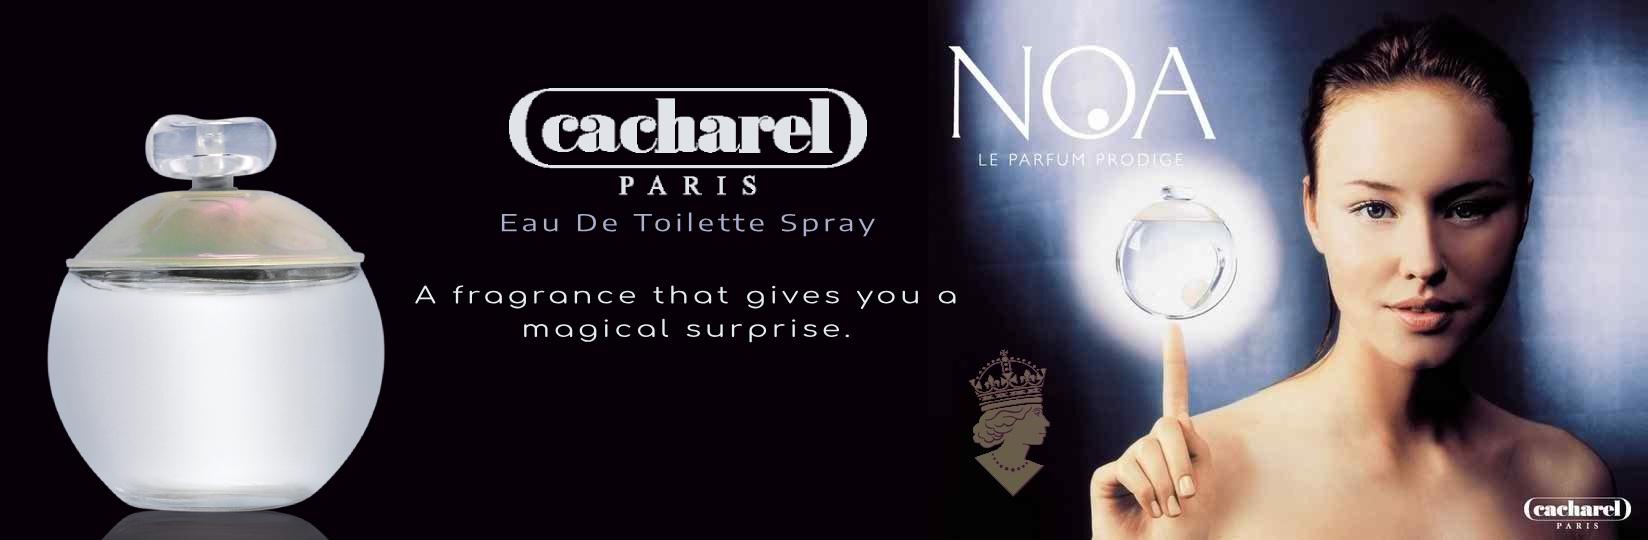 Cacharel Noa Eau De Toilette Spray 100 ml | Buy Online | Ubuy Kuwait